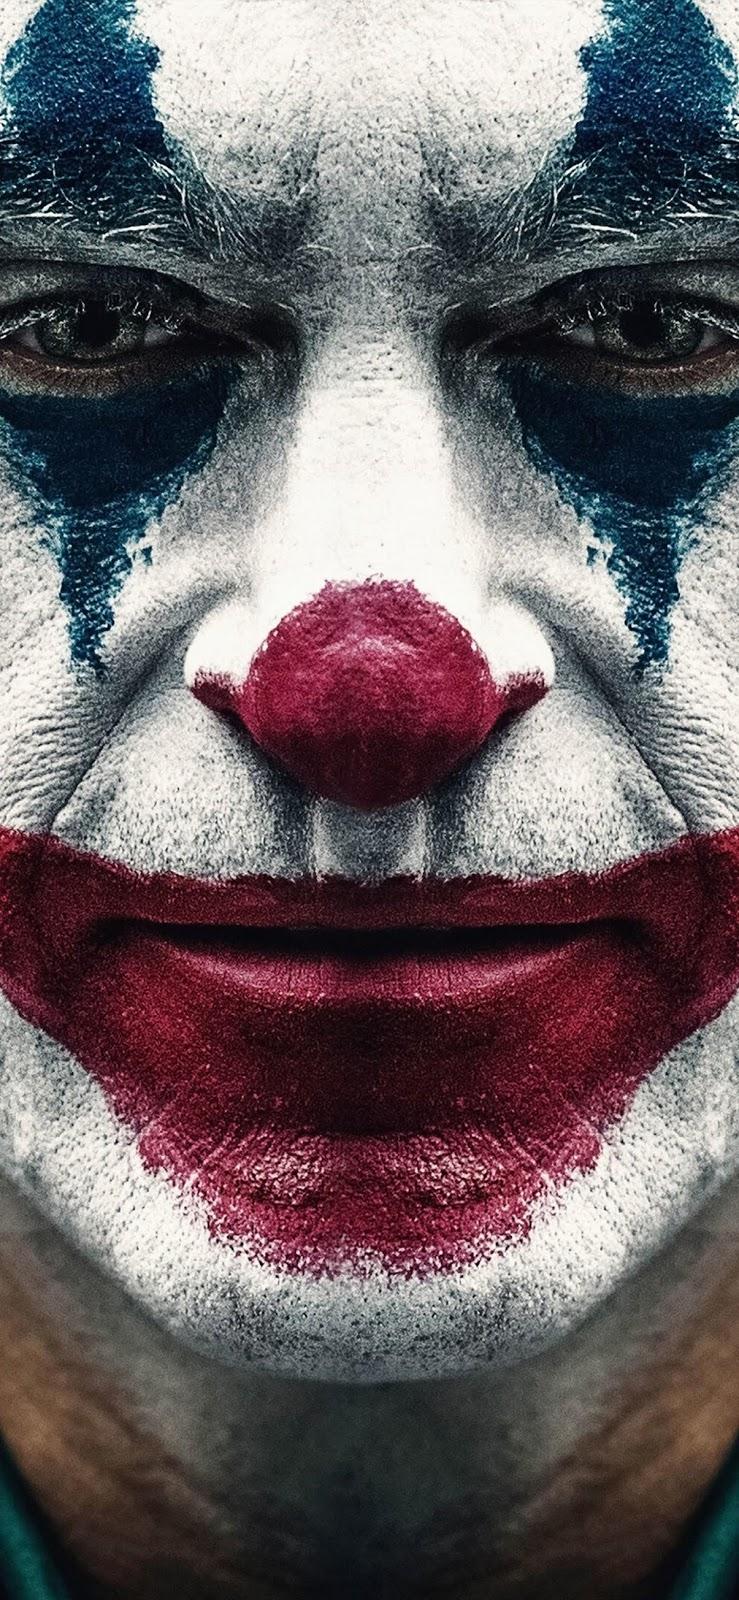 joker 2019 joaquin phoenix clown iphone xs max wallpaper